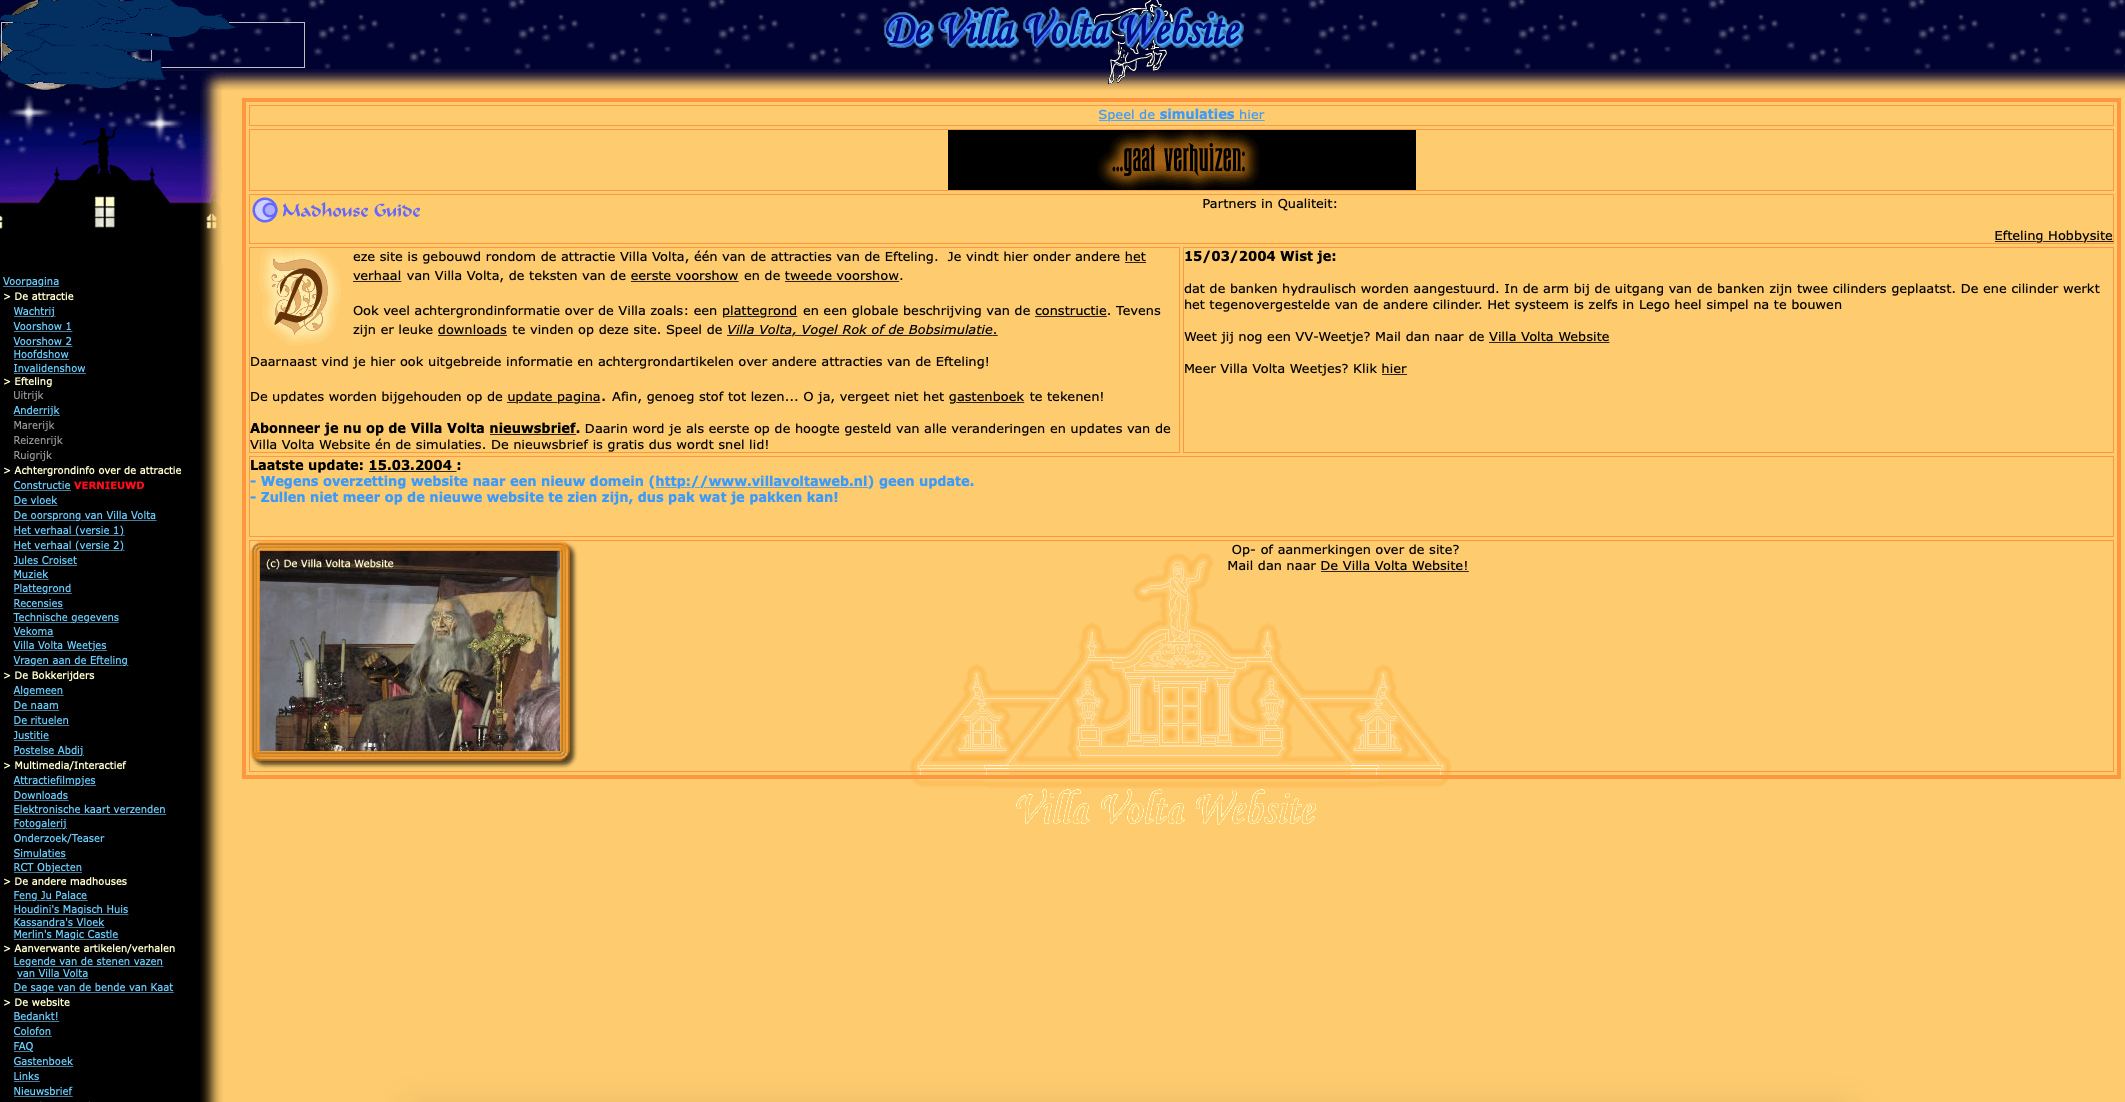 Villa_Volta_Web_2de_versie.png